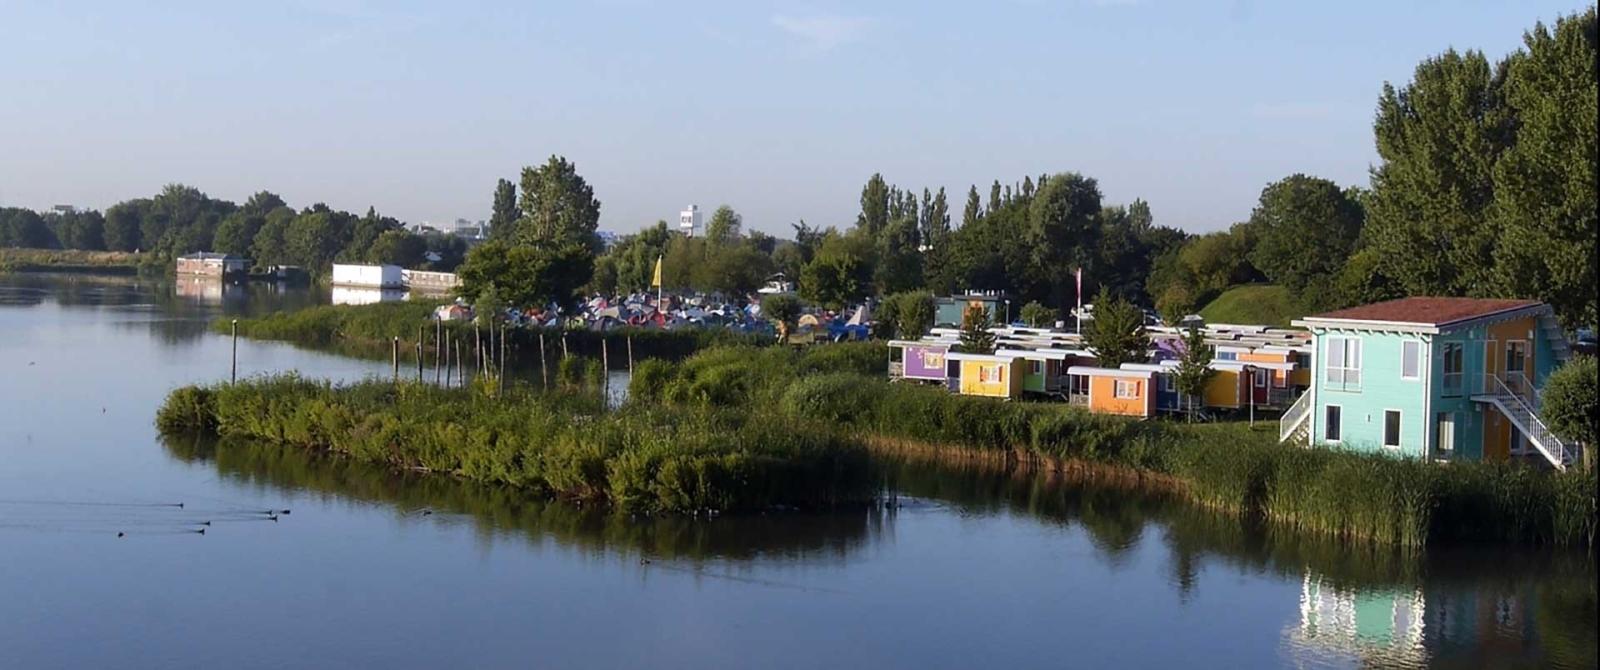 Foto: Camping Zeeburg.